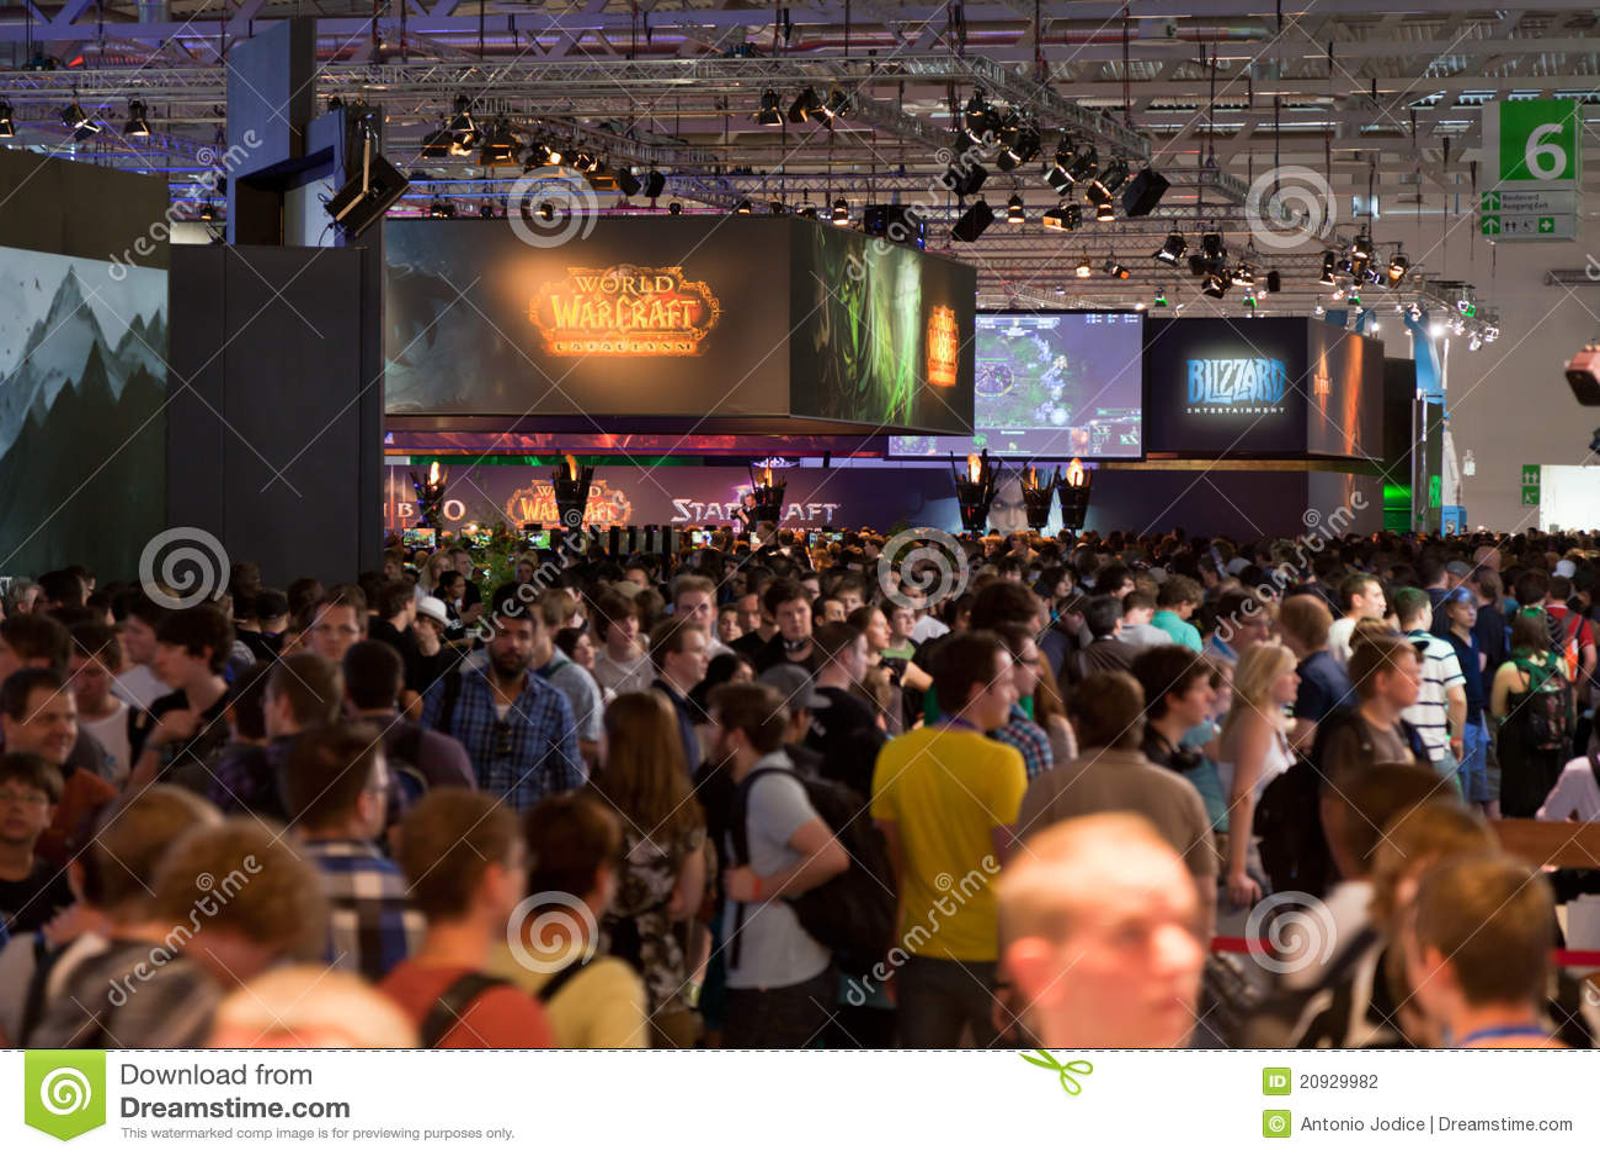 Thousands gamers at Gamescom 2011